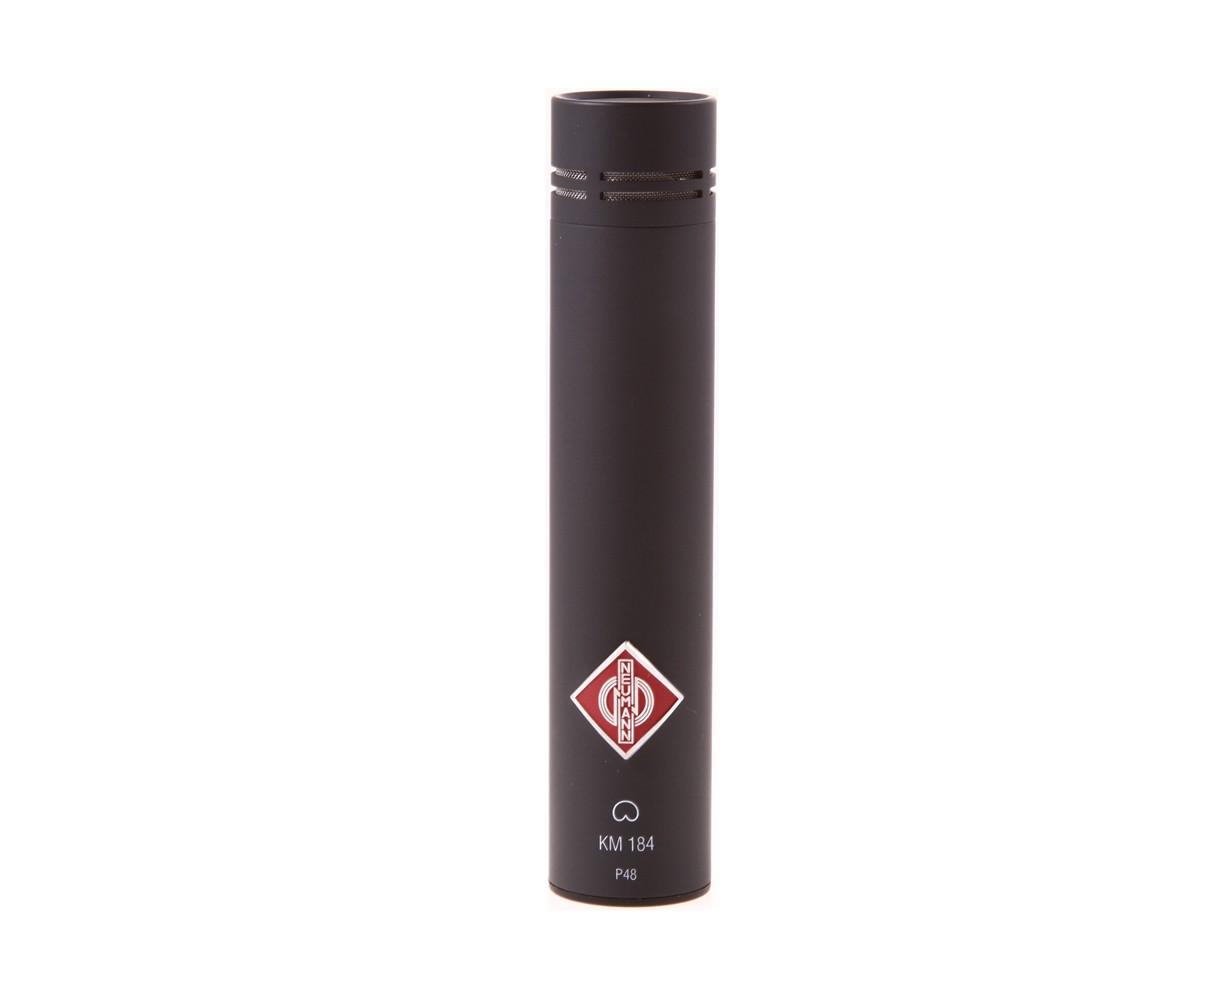 Neumann KM184MT Cardioid Small Diaphragm Microphone